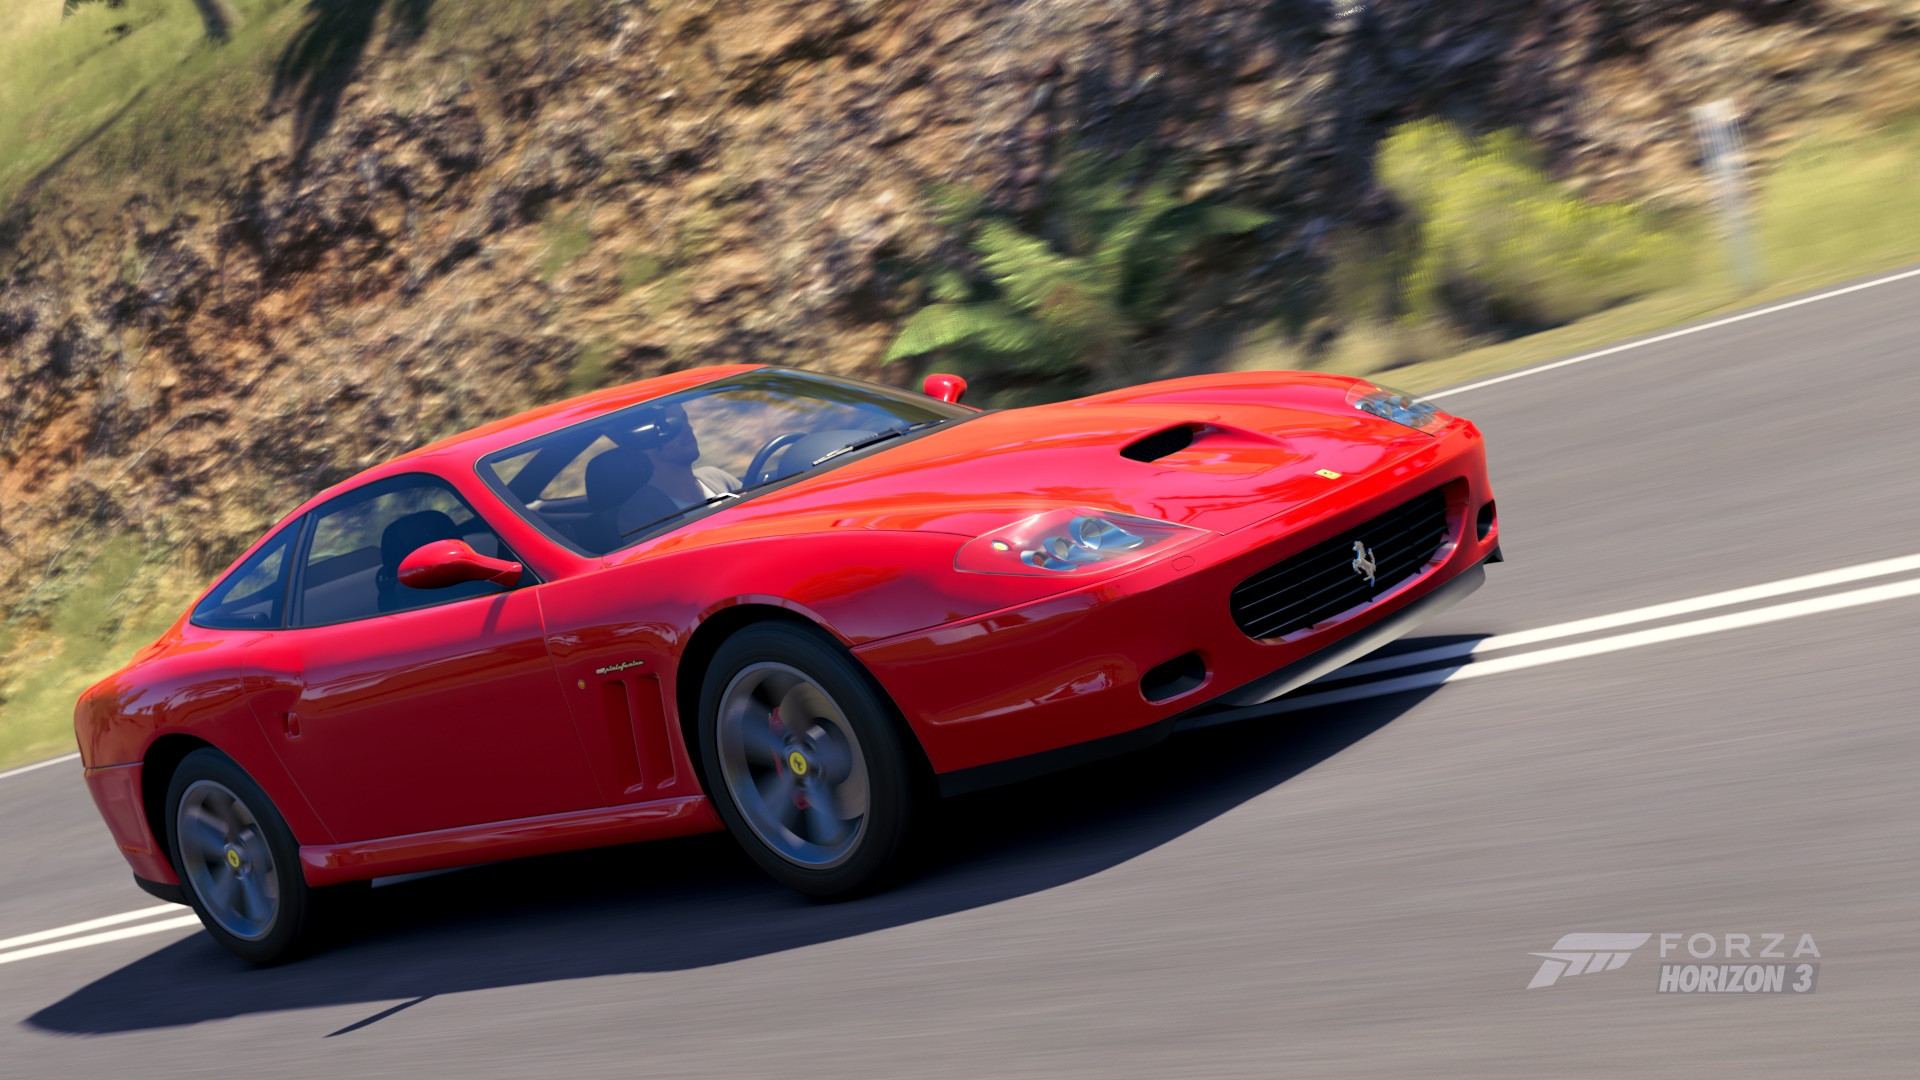 2f117d7f-2b2e-49bb-a4a7-784fd2e90986.jpg?n=2002%20Ferrari%20575M%20Maranello%20Maciek1125 Fabulous Ferrari Mondial 8 Super Elite Cars Trend